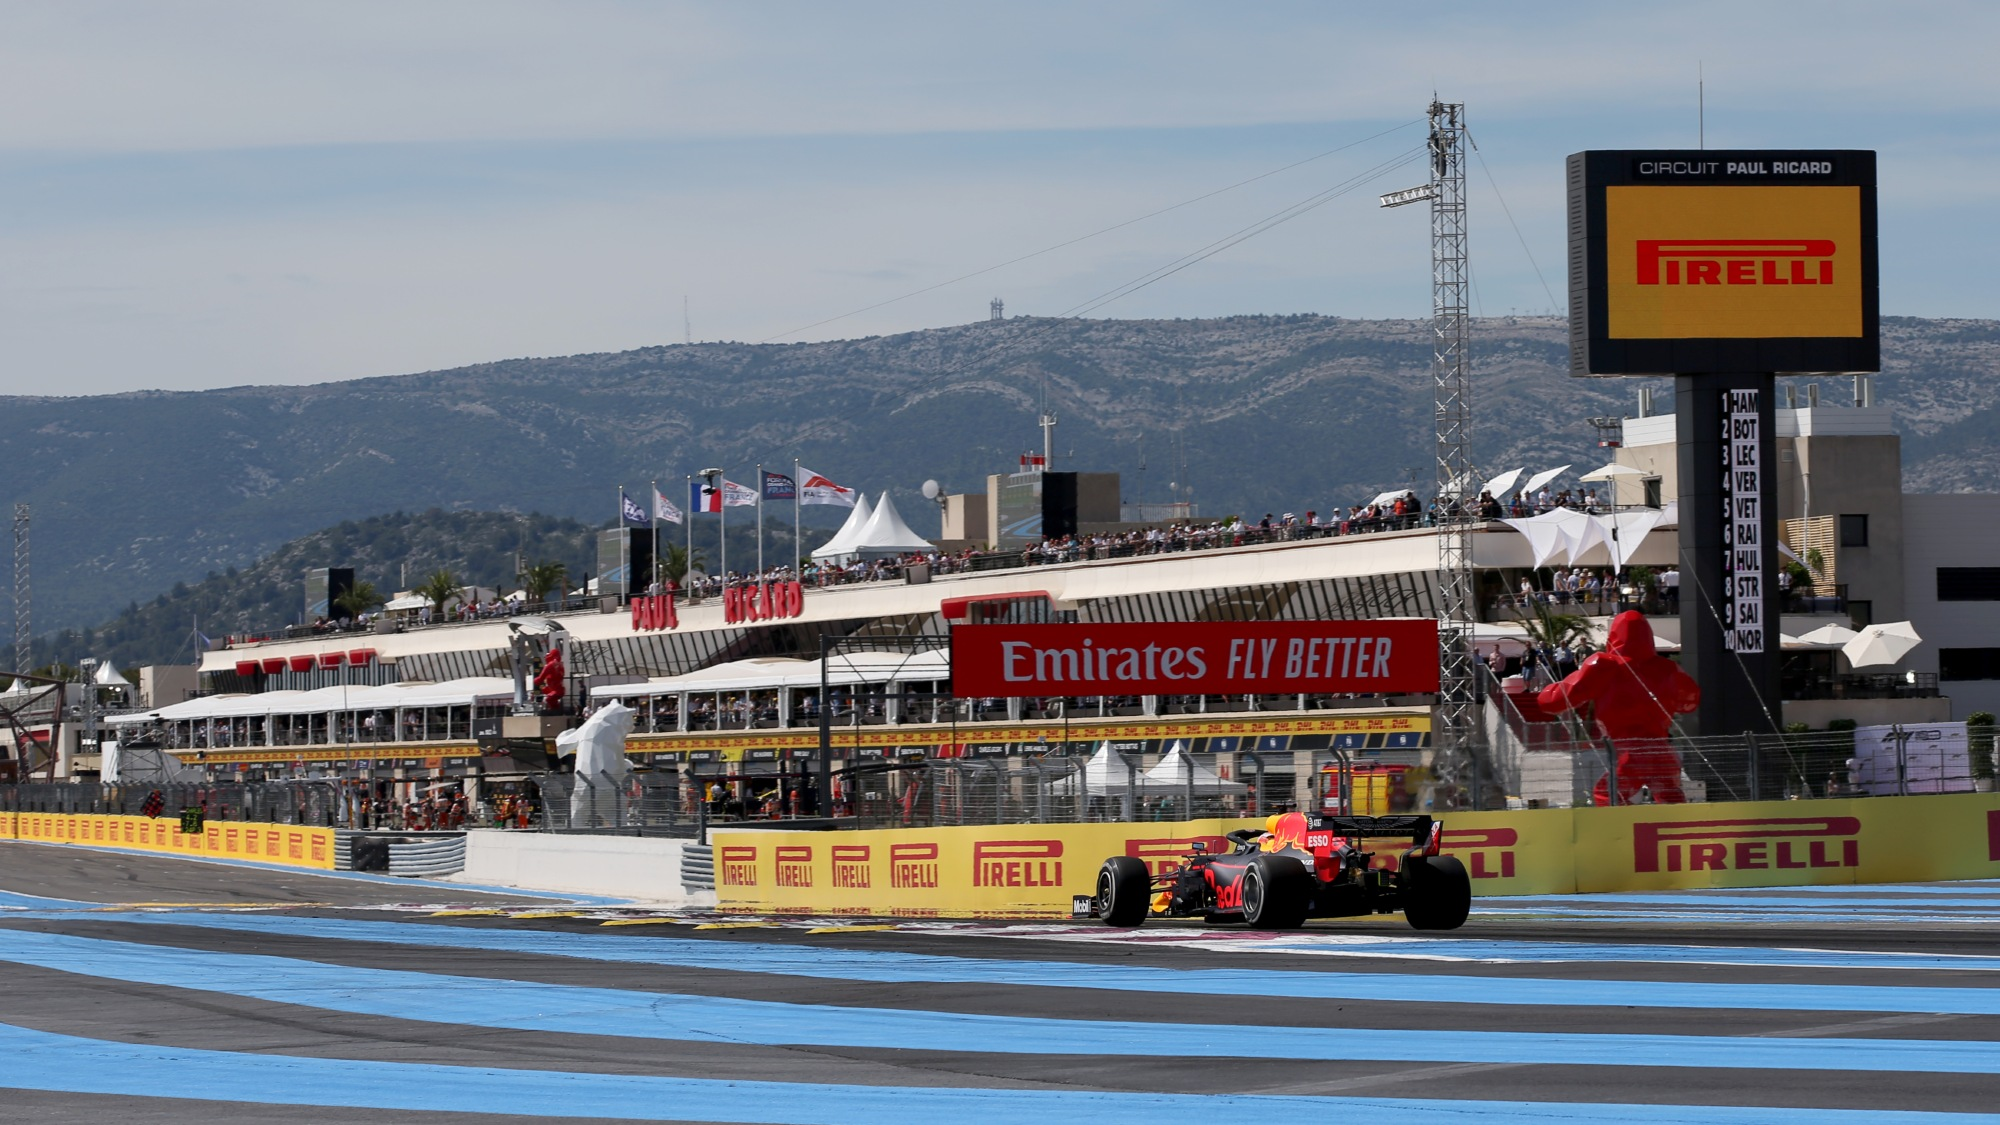 Max Verstappen, 2019 French GP